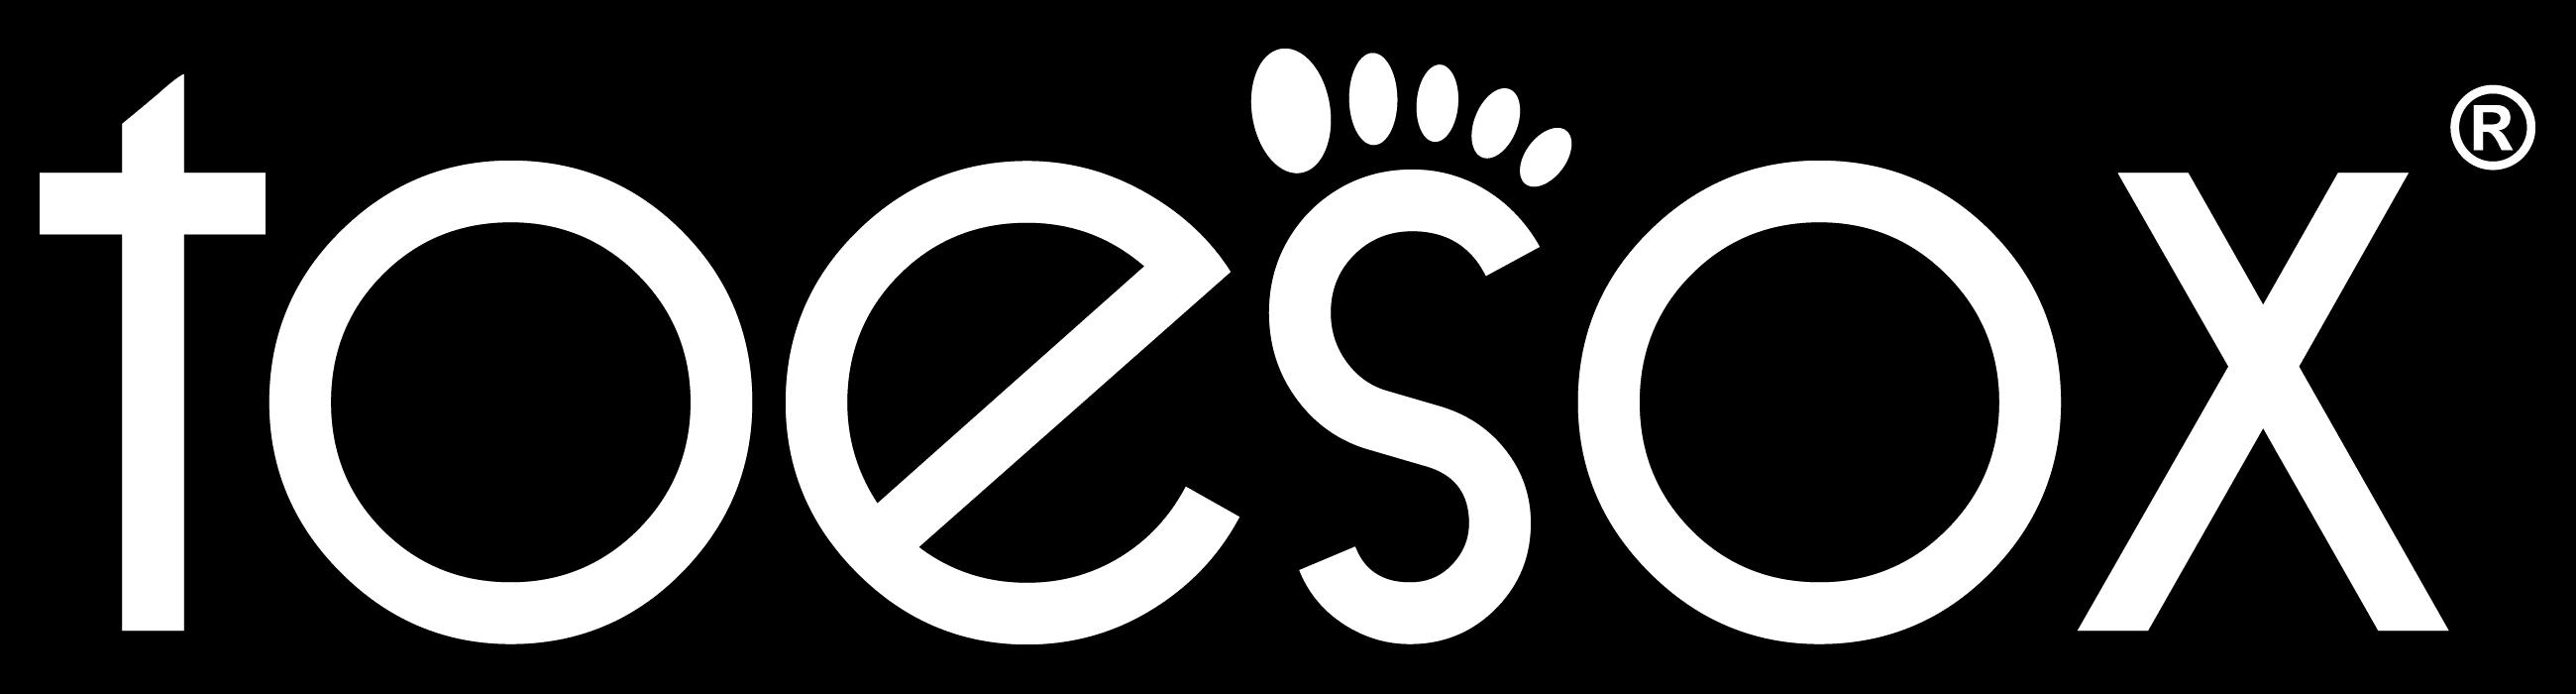 ToeSox  Five Toe Socks and Sandals